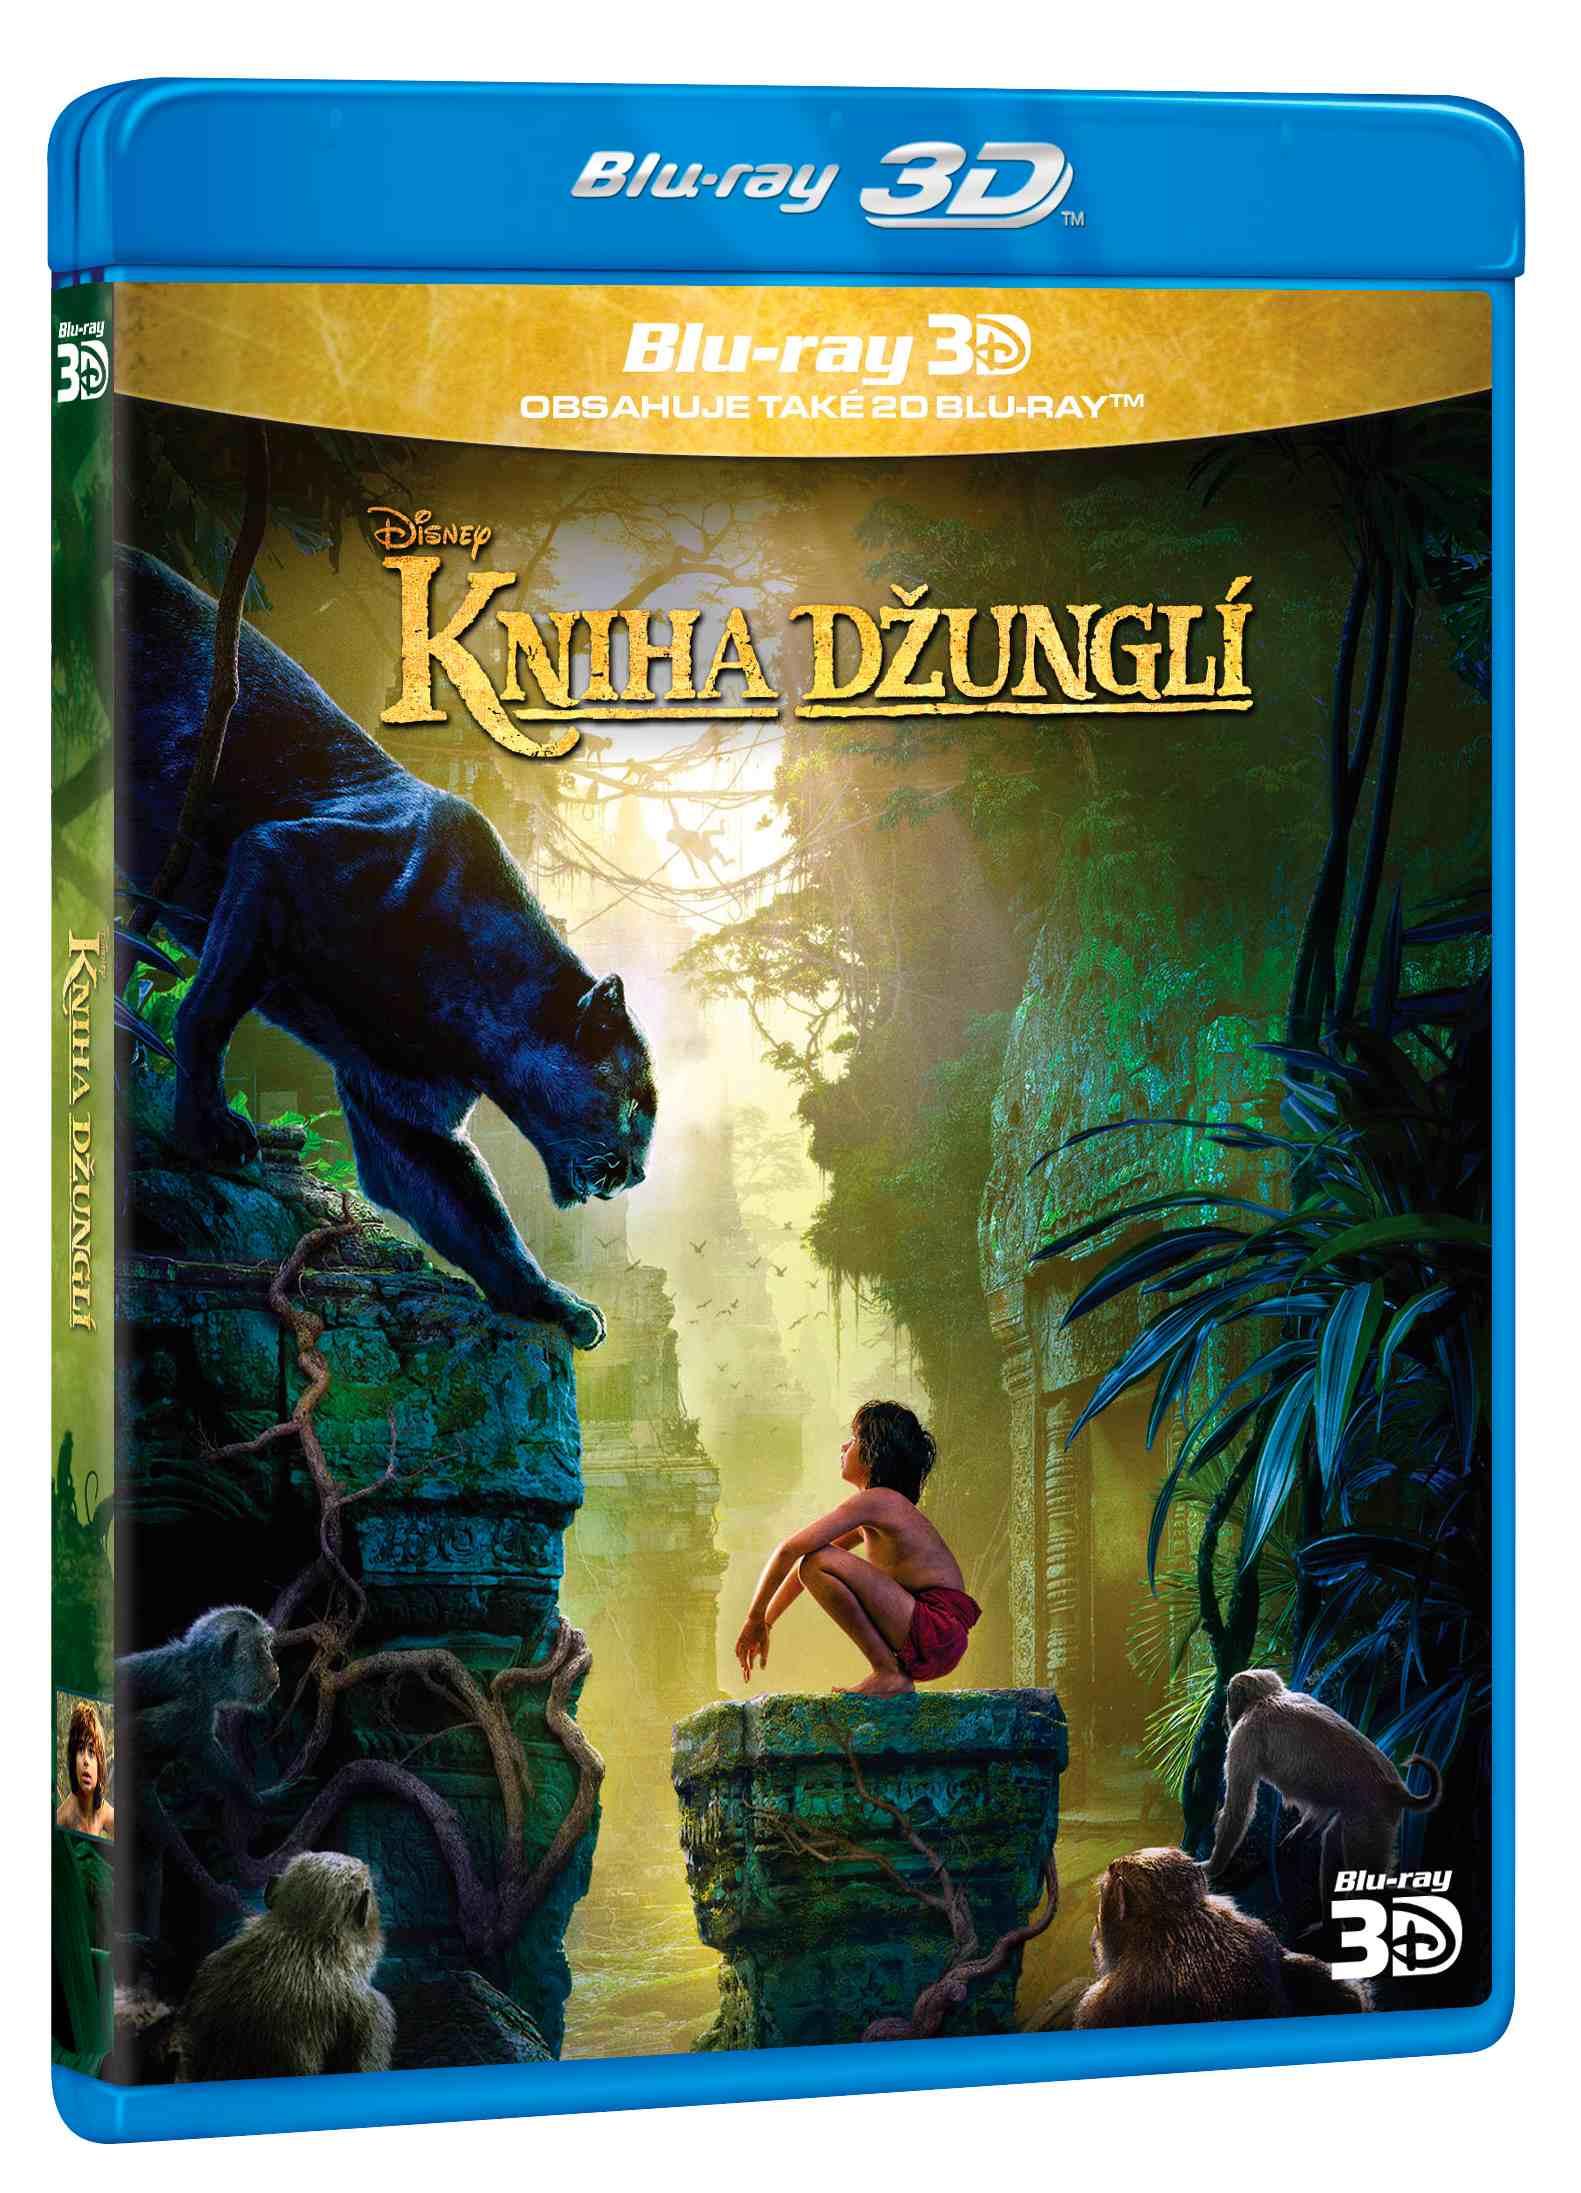 KNIHA DŽUNGLÍ (2016) - Blu-ray 3D + 2D